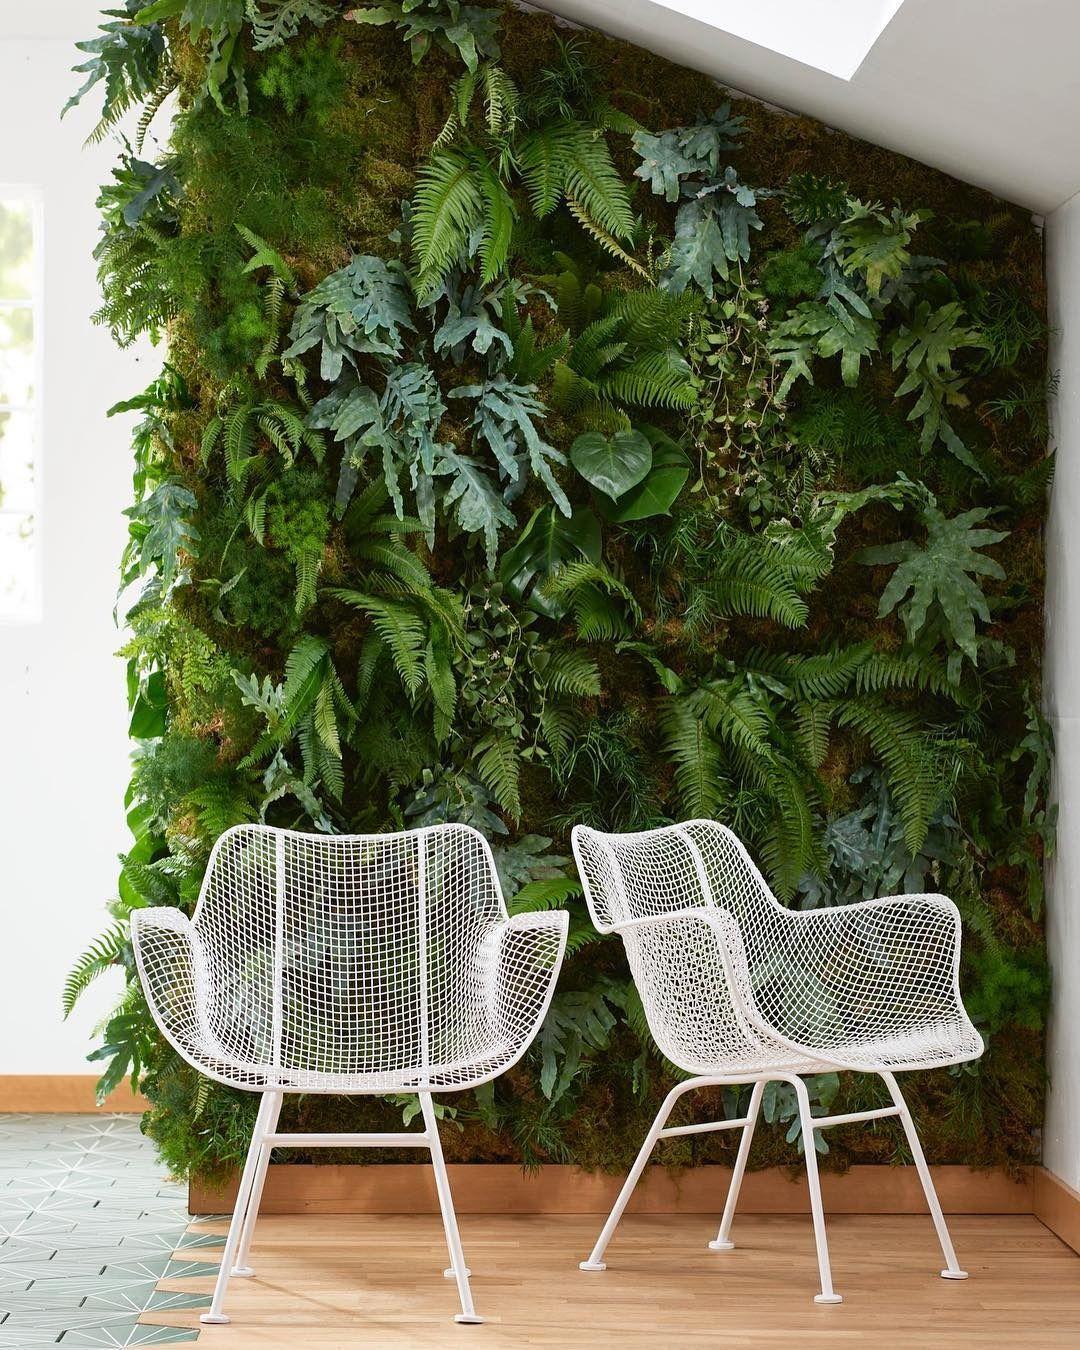 Midcentury Modern Patio Furniture